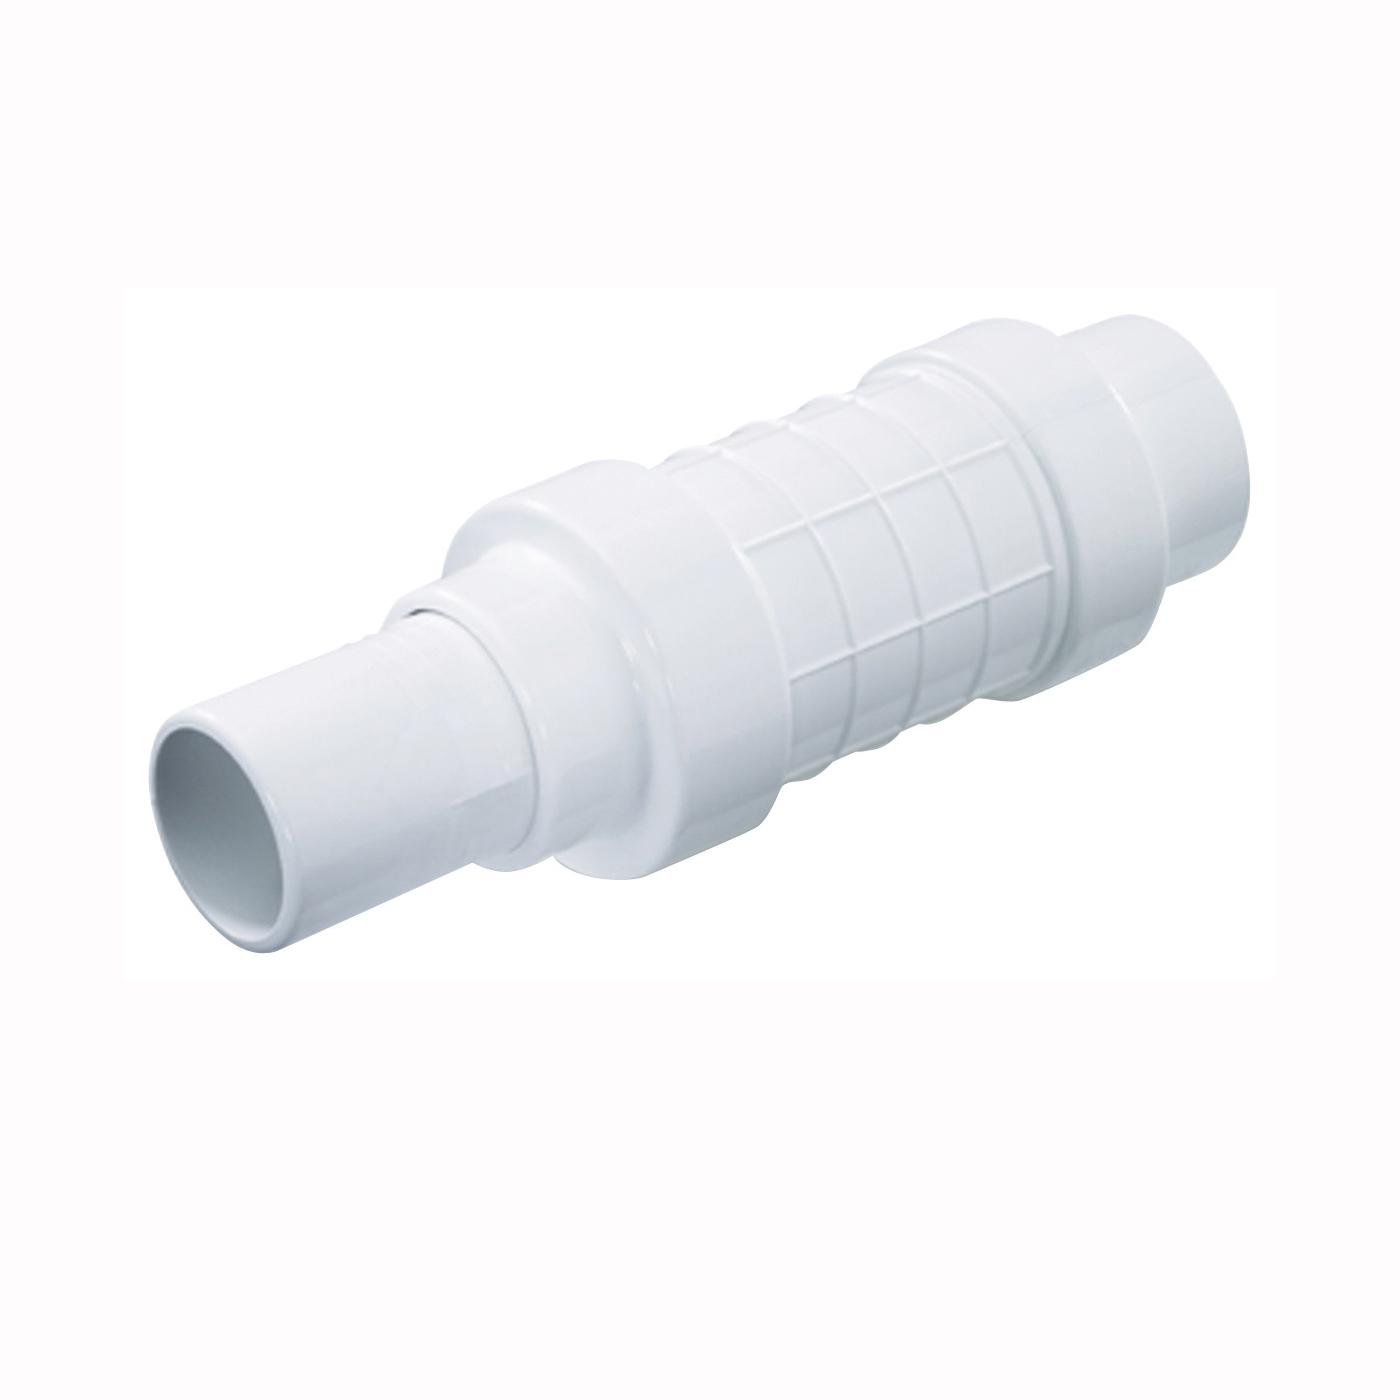 Picture of NDS Quik-Fix QF-2000 Pipe Repair Coupler, 2 in, Socket x Spigot, White, SCH 40 Schedule, 150 psi Pressure